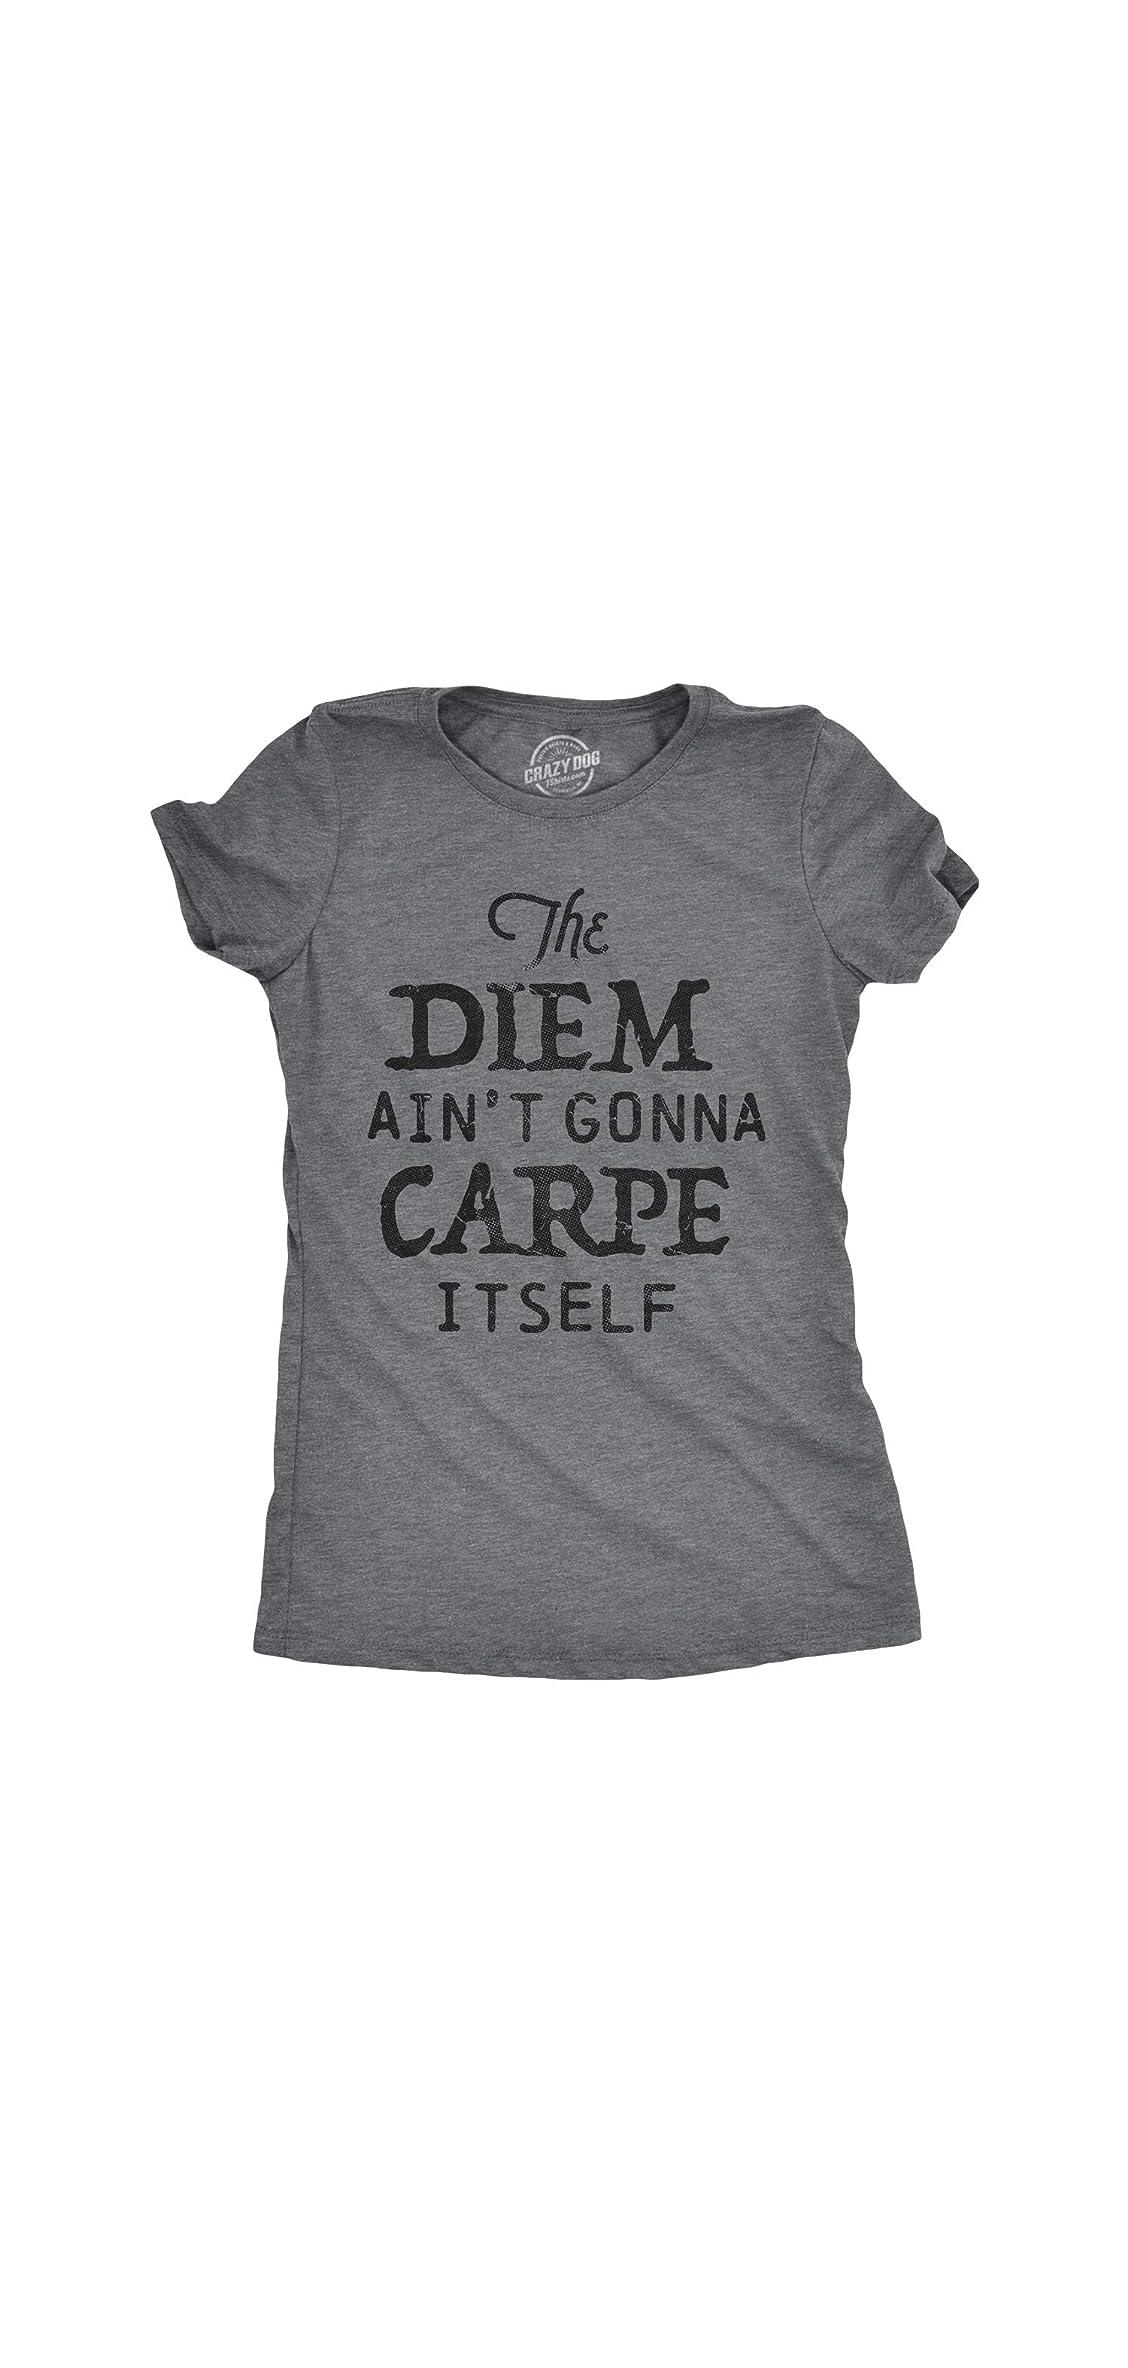 Womens The Diem Aint Gonna Carpe Itself Tshirt Funny Tee